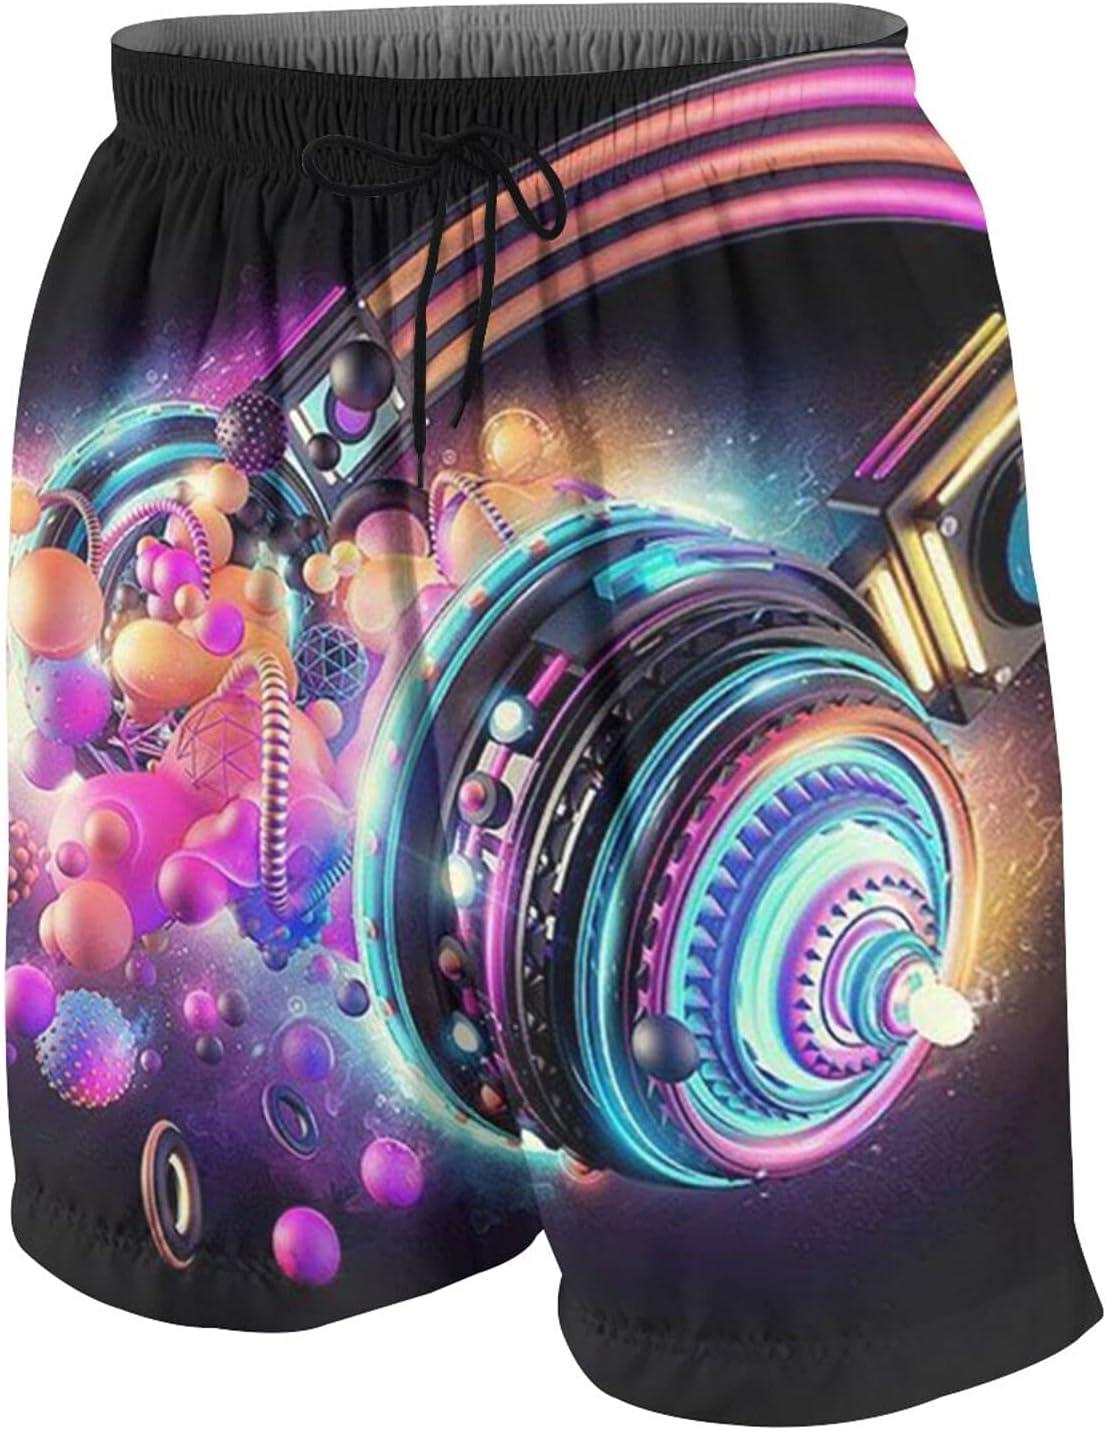 KAETZRU Boys Swim Trunks Phoenix Mall Beach Board Max 72% OFF Dj Abstract Music Shorts He